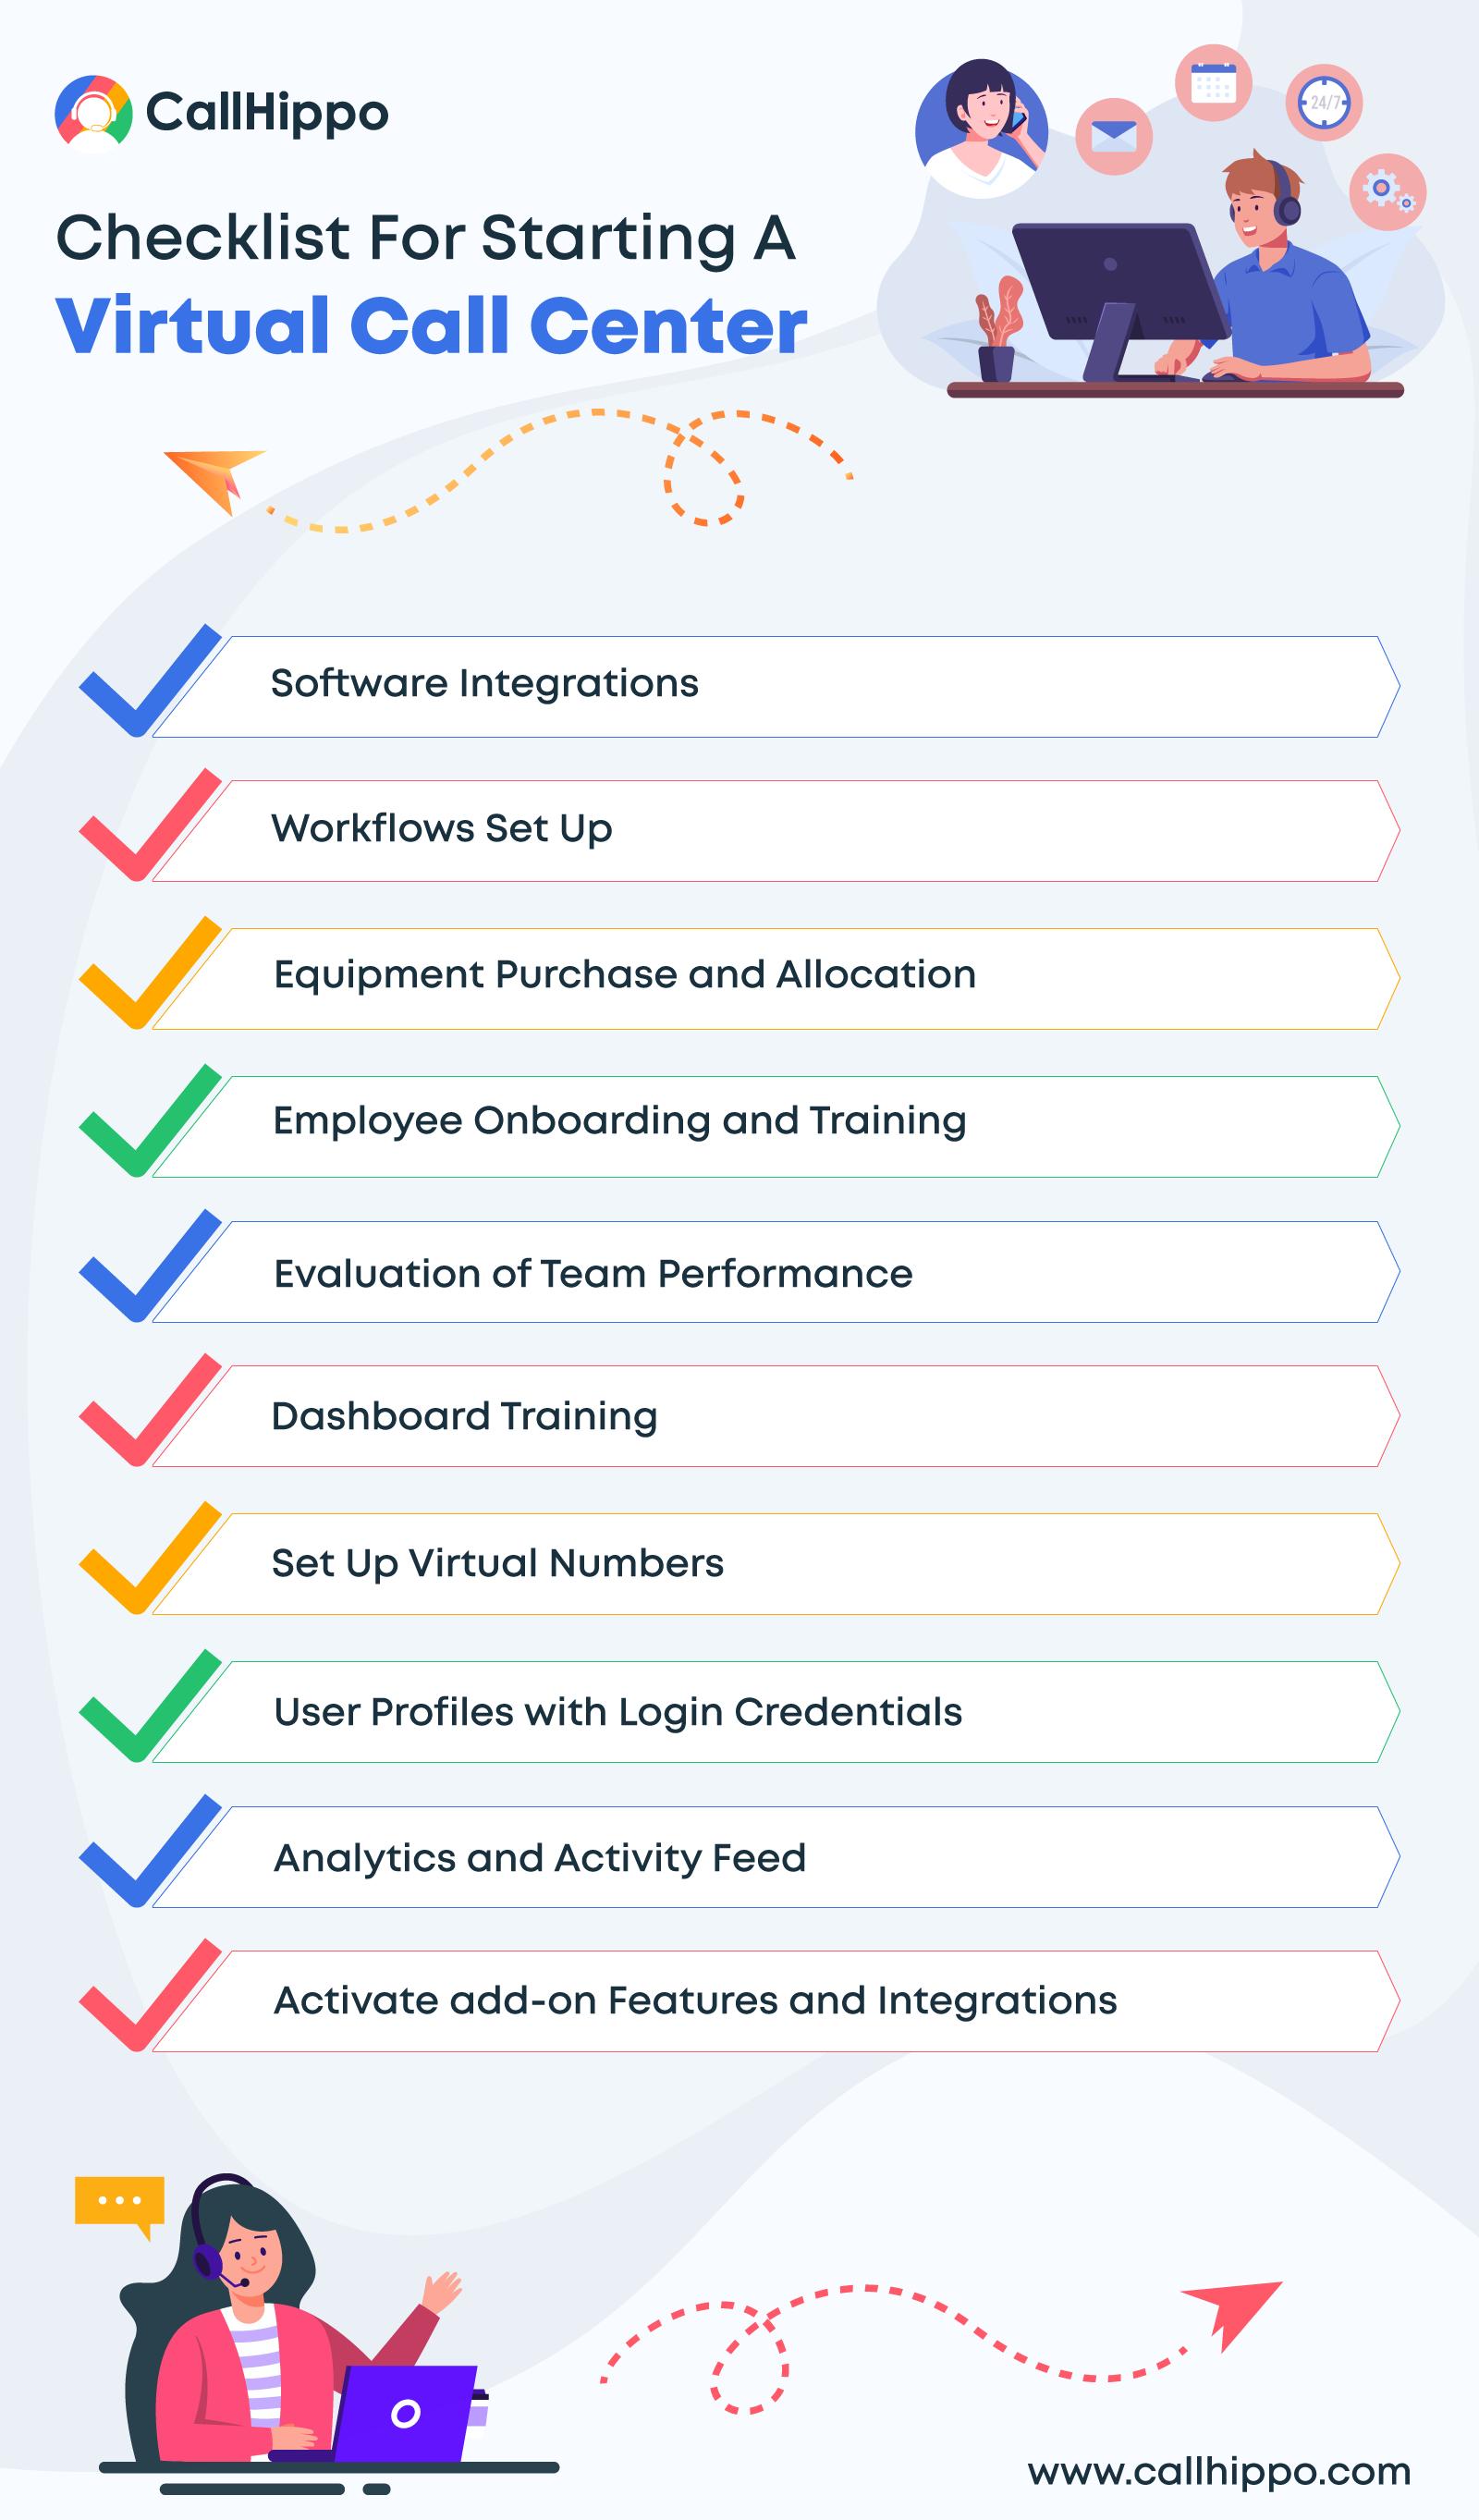 Checklist for starting a virtual call center